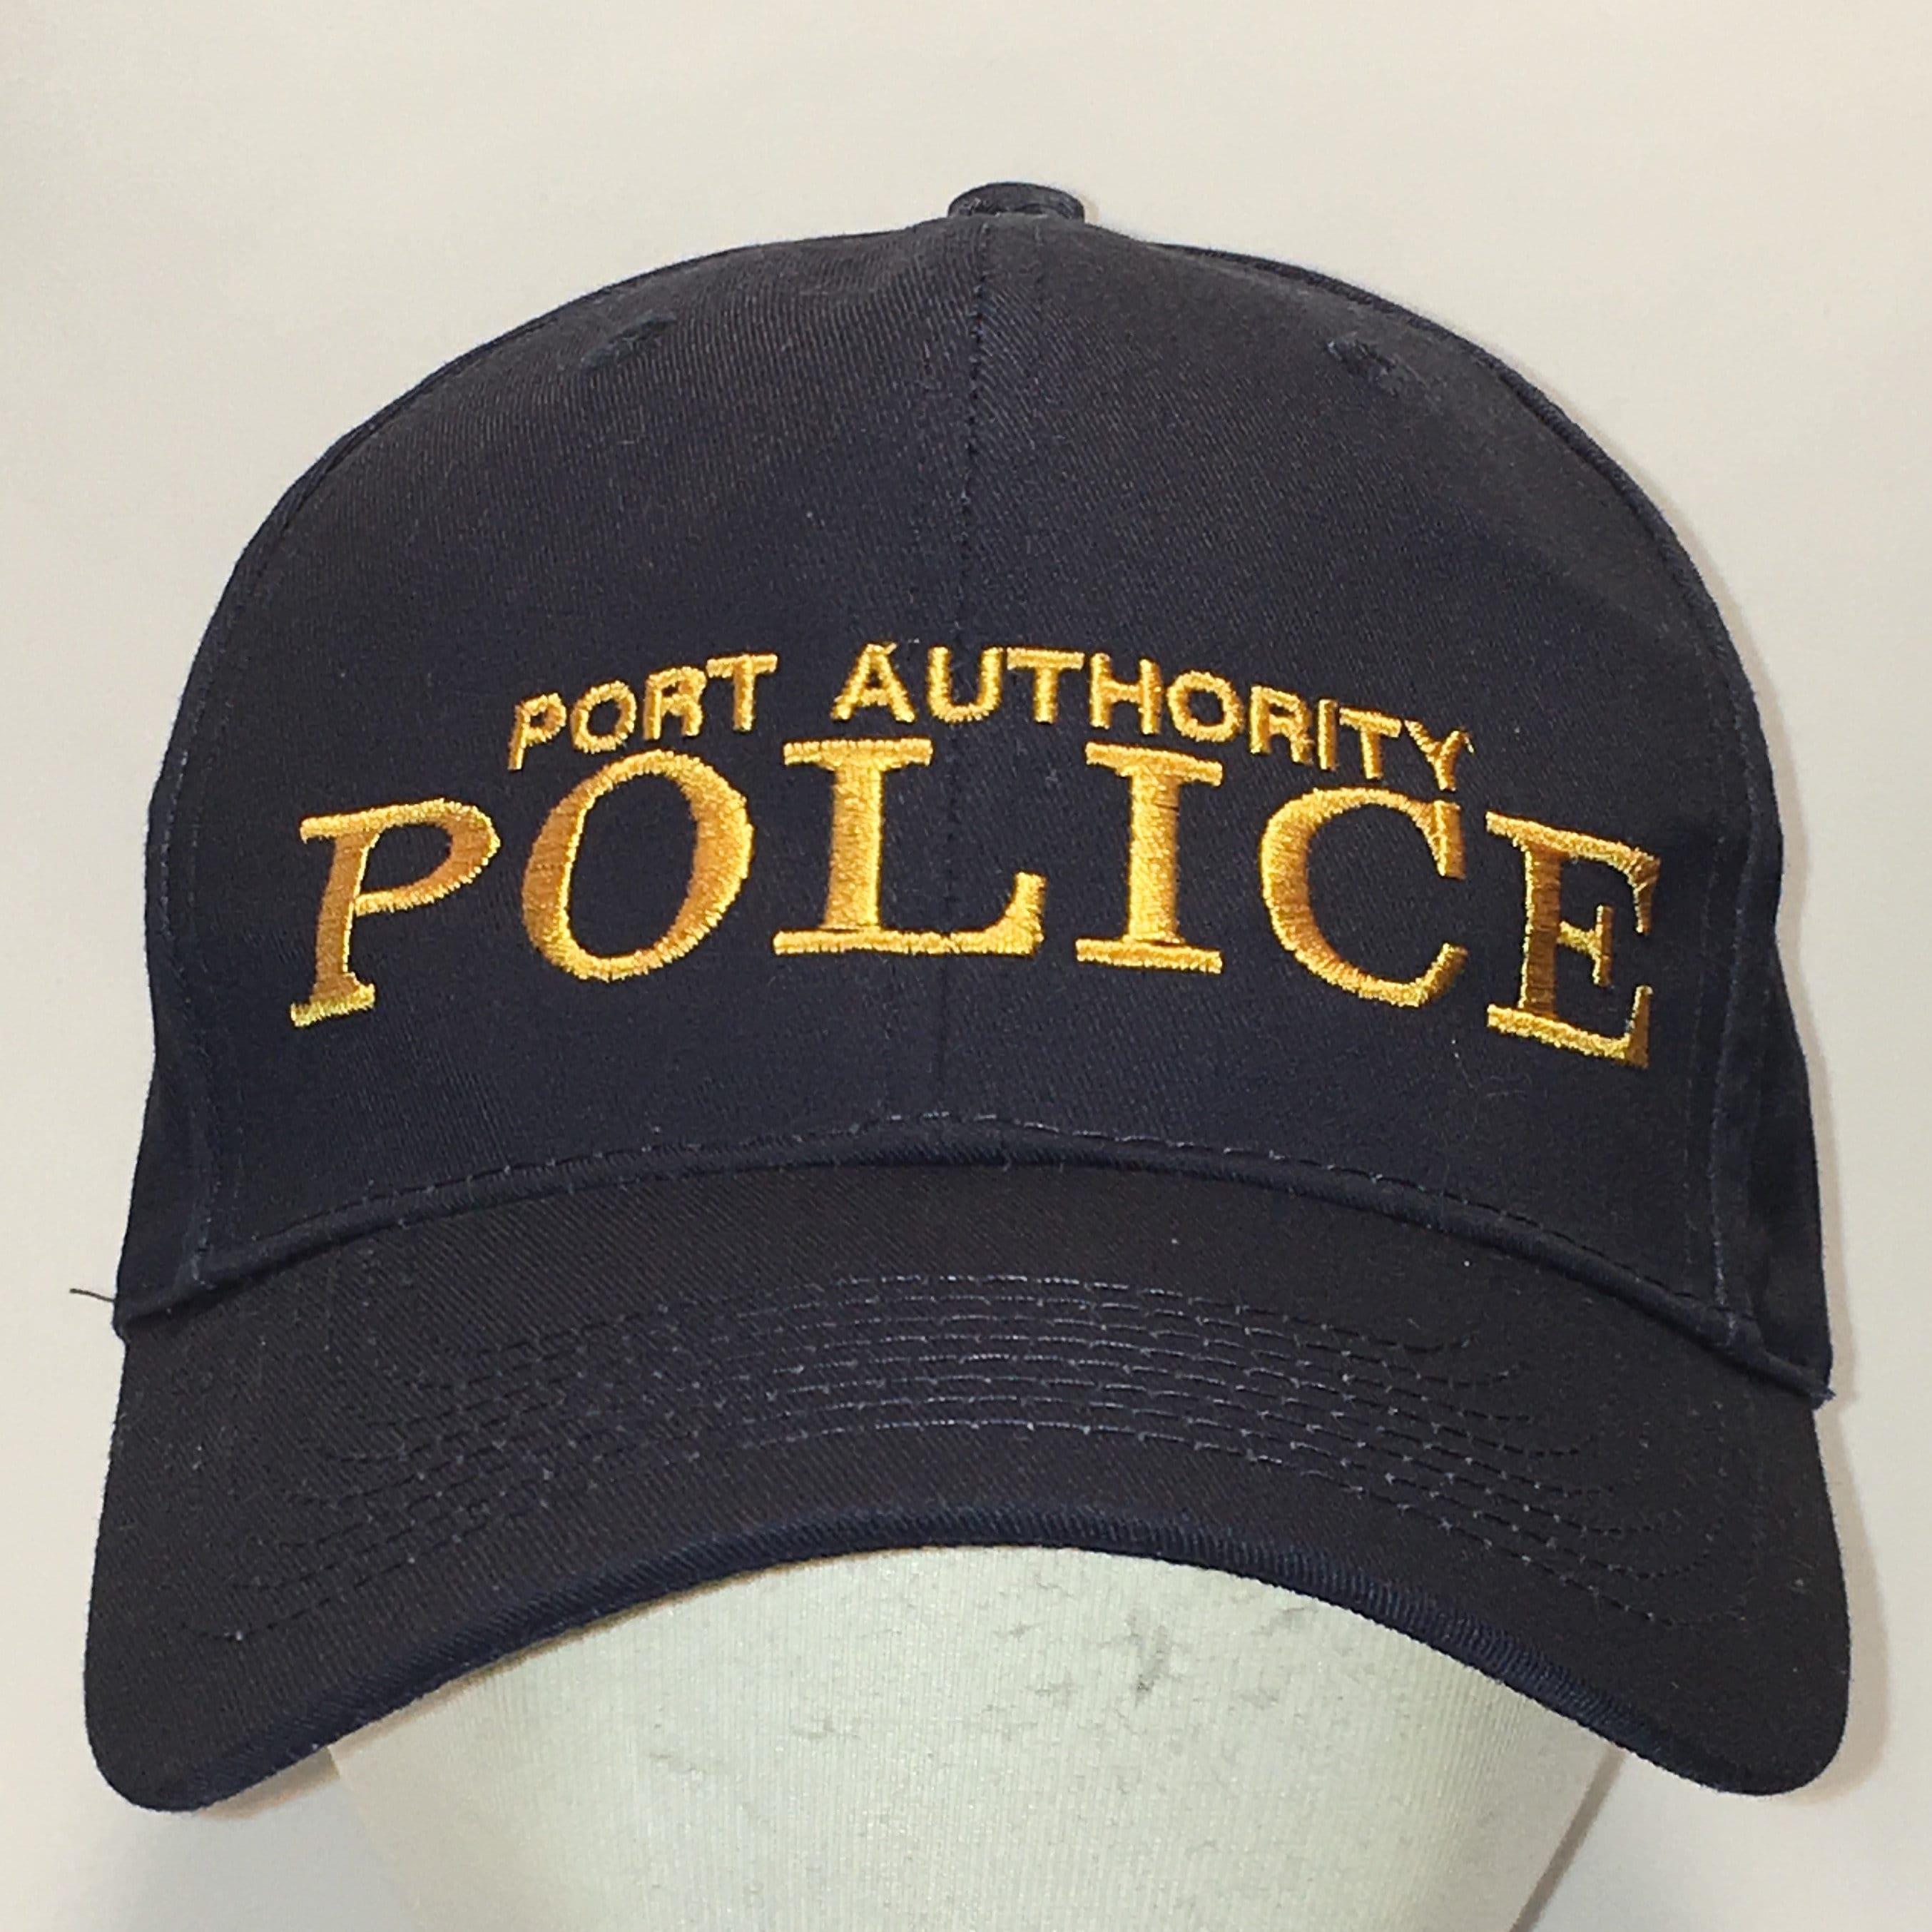 Vintage Port Authority Police NYC Snapback Hat Navy Blue  6fe48e23e48